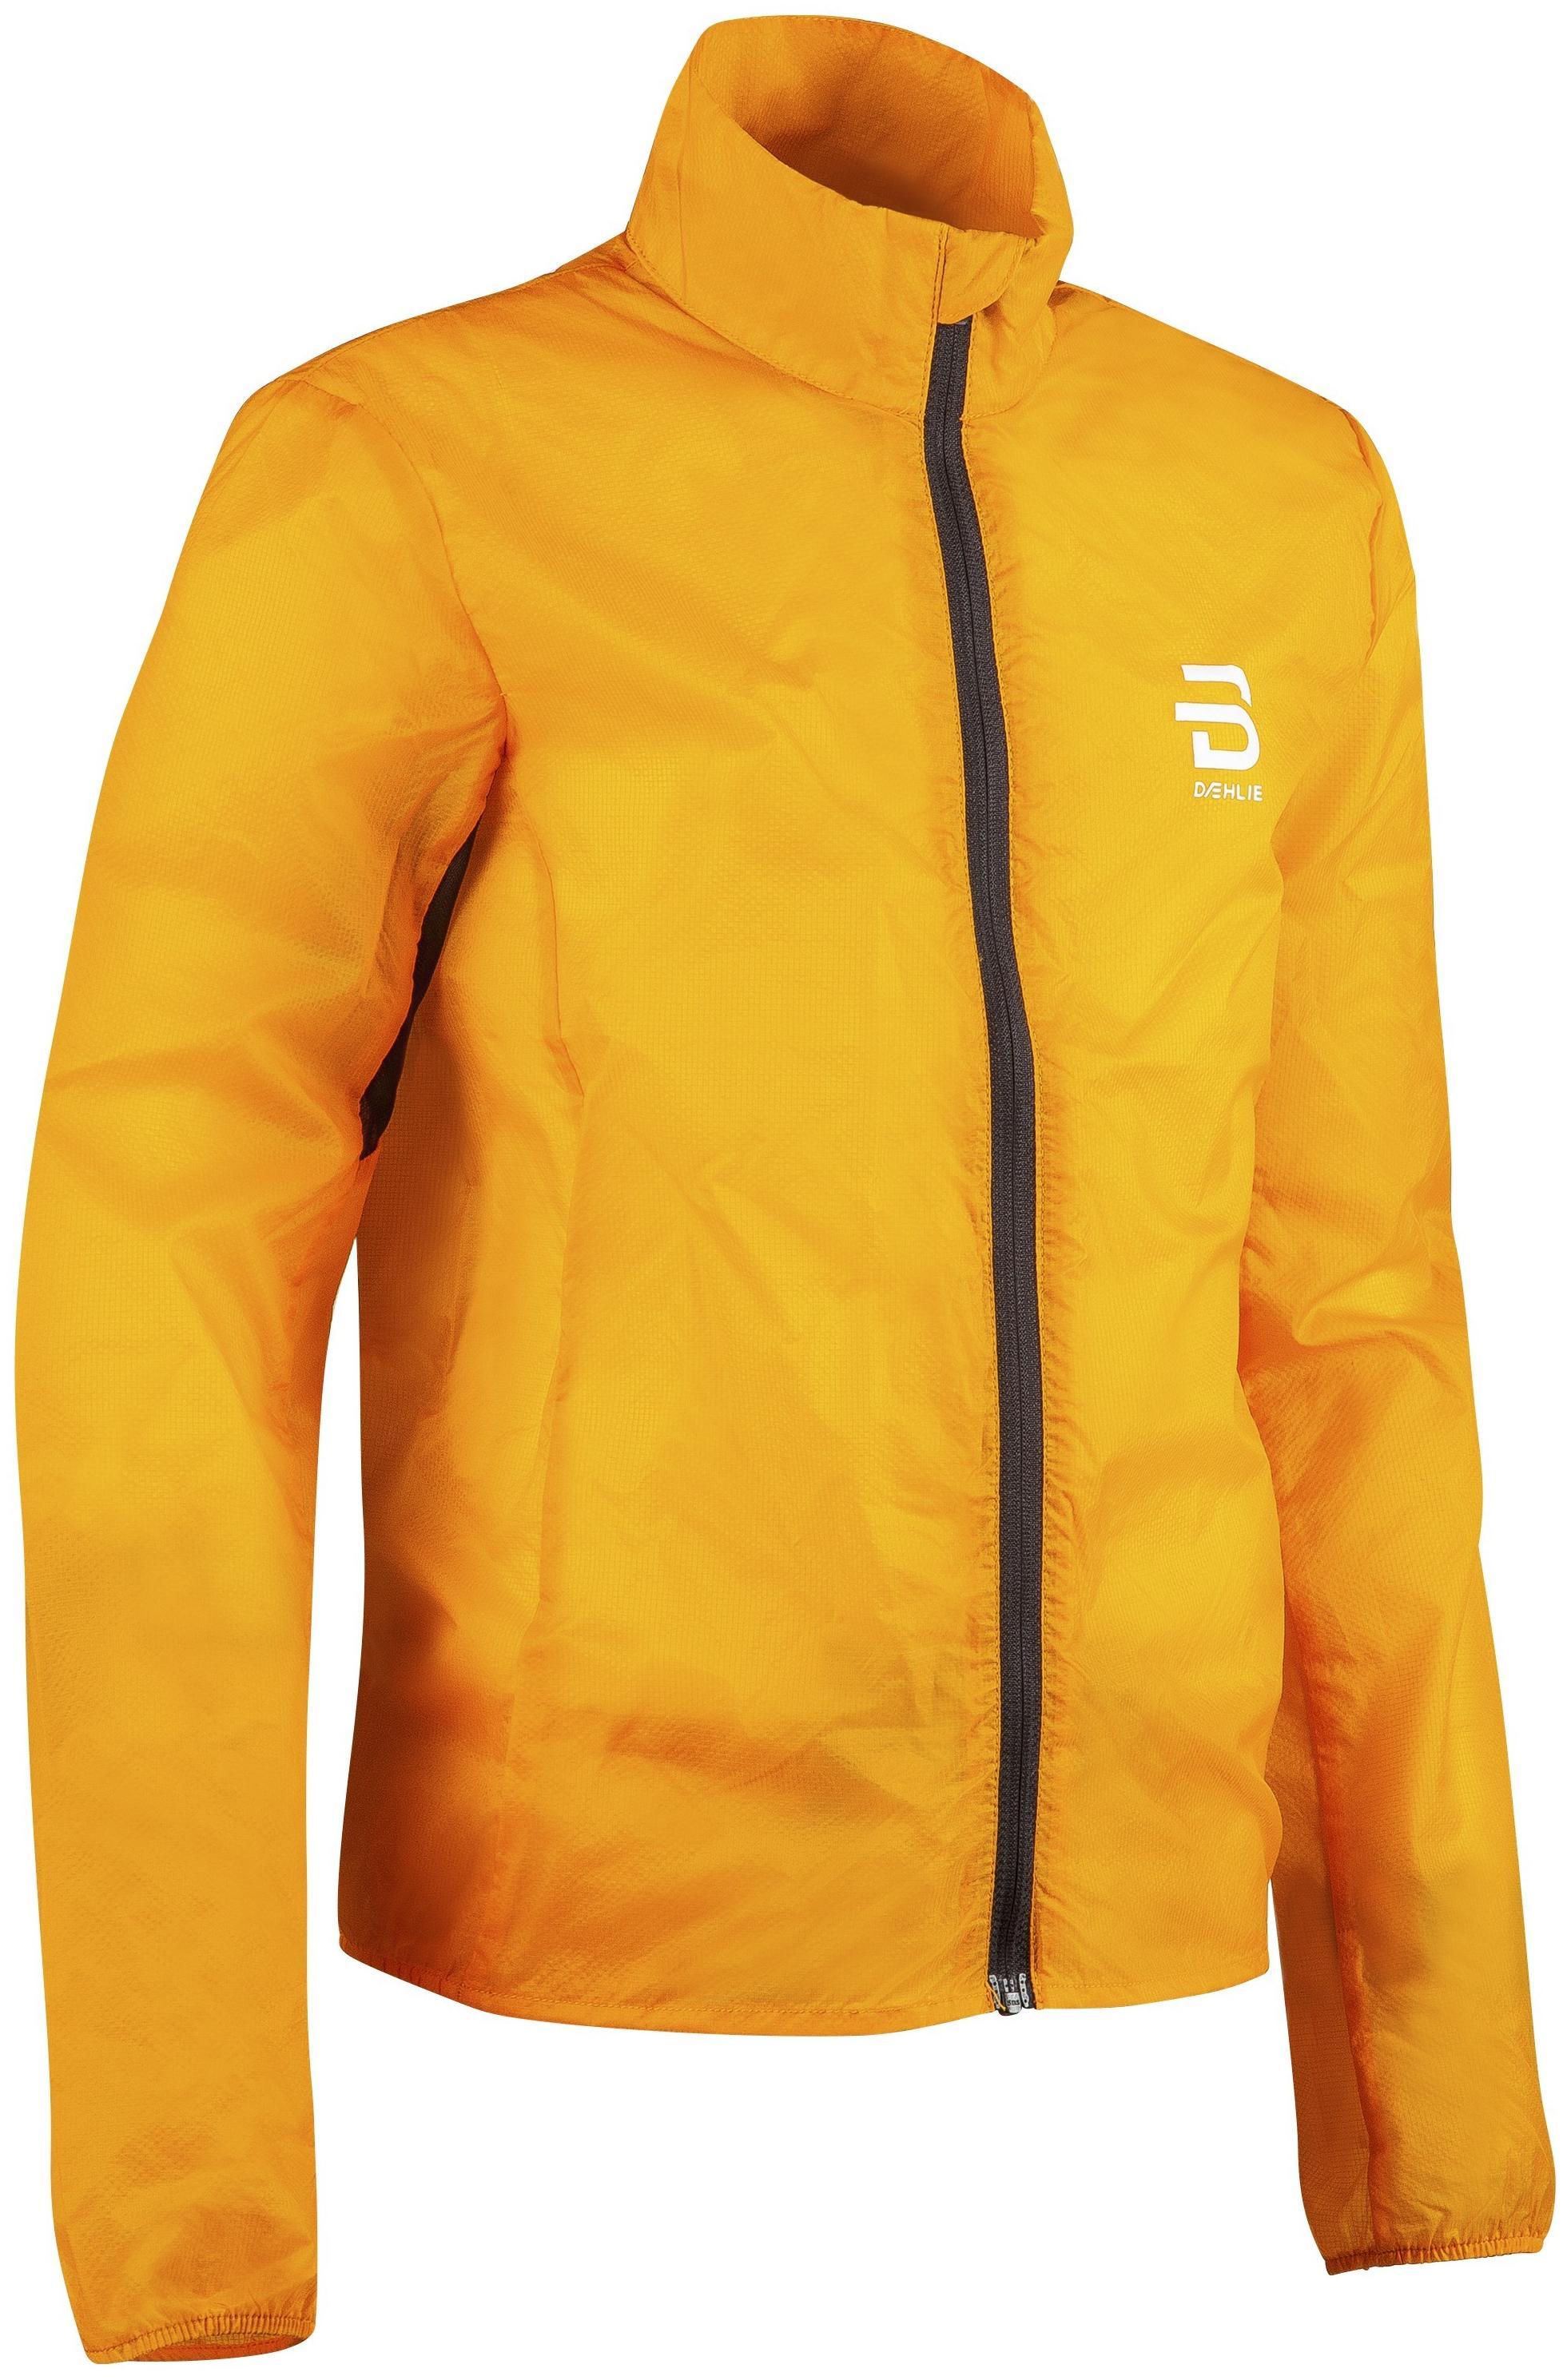 Куртка беговая Bjorn Daehlie 2018 Jacket Oxygen Jr Orange, Летние куртки - арт. 1033600328